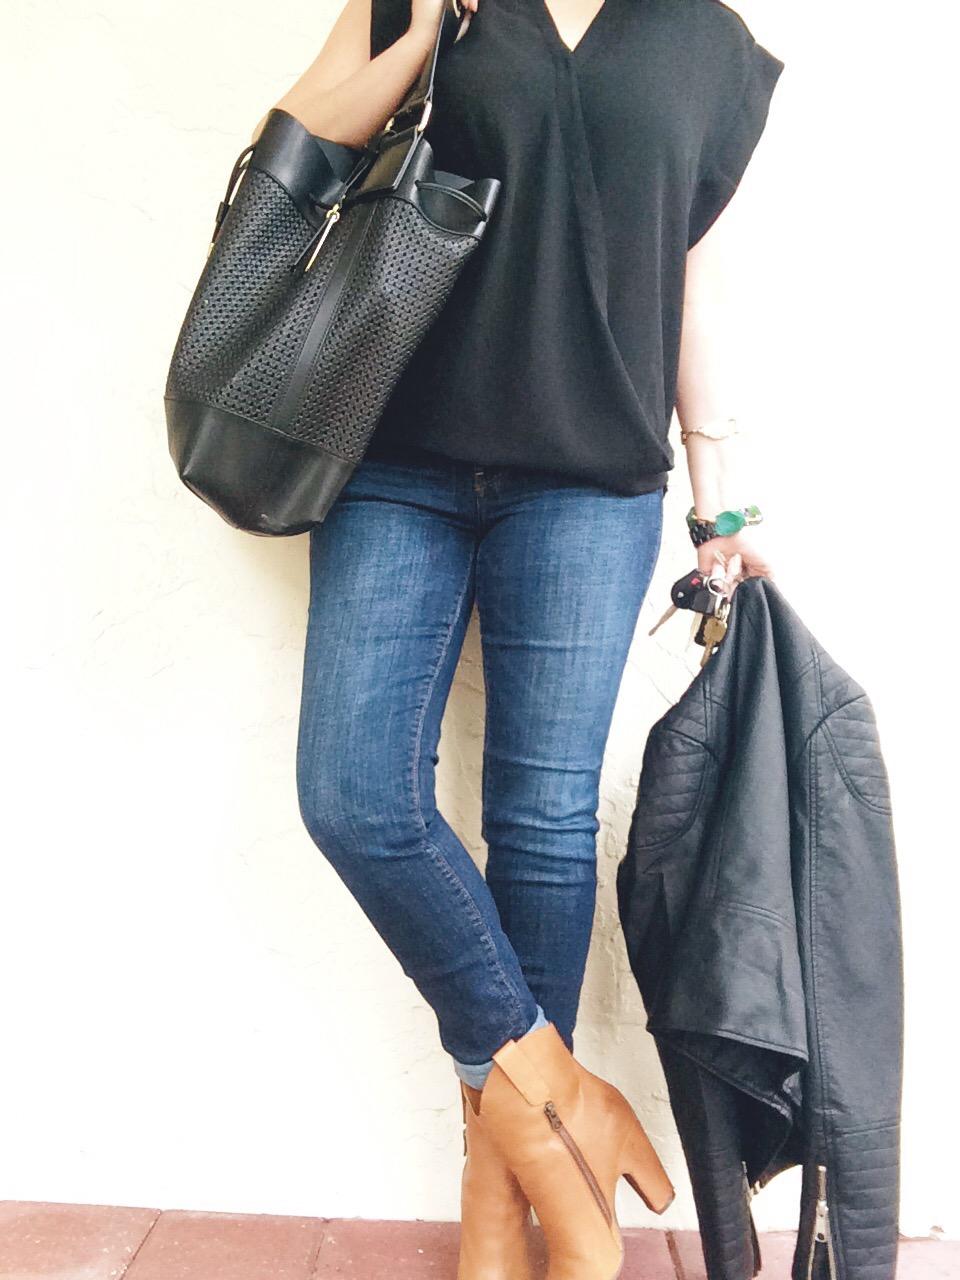 A Pretty Penny Korkease Lena Boots